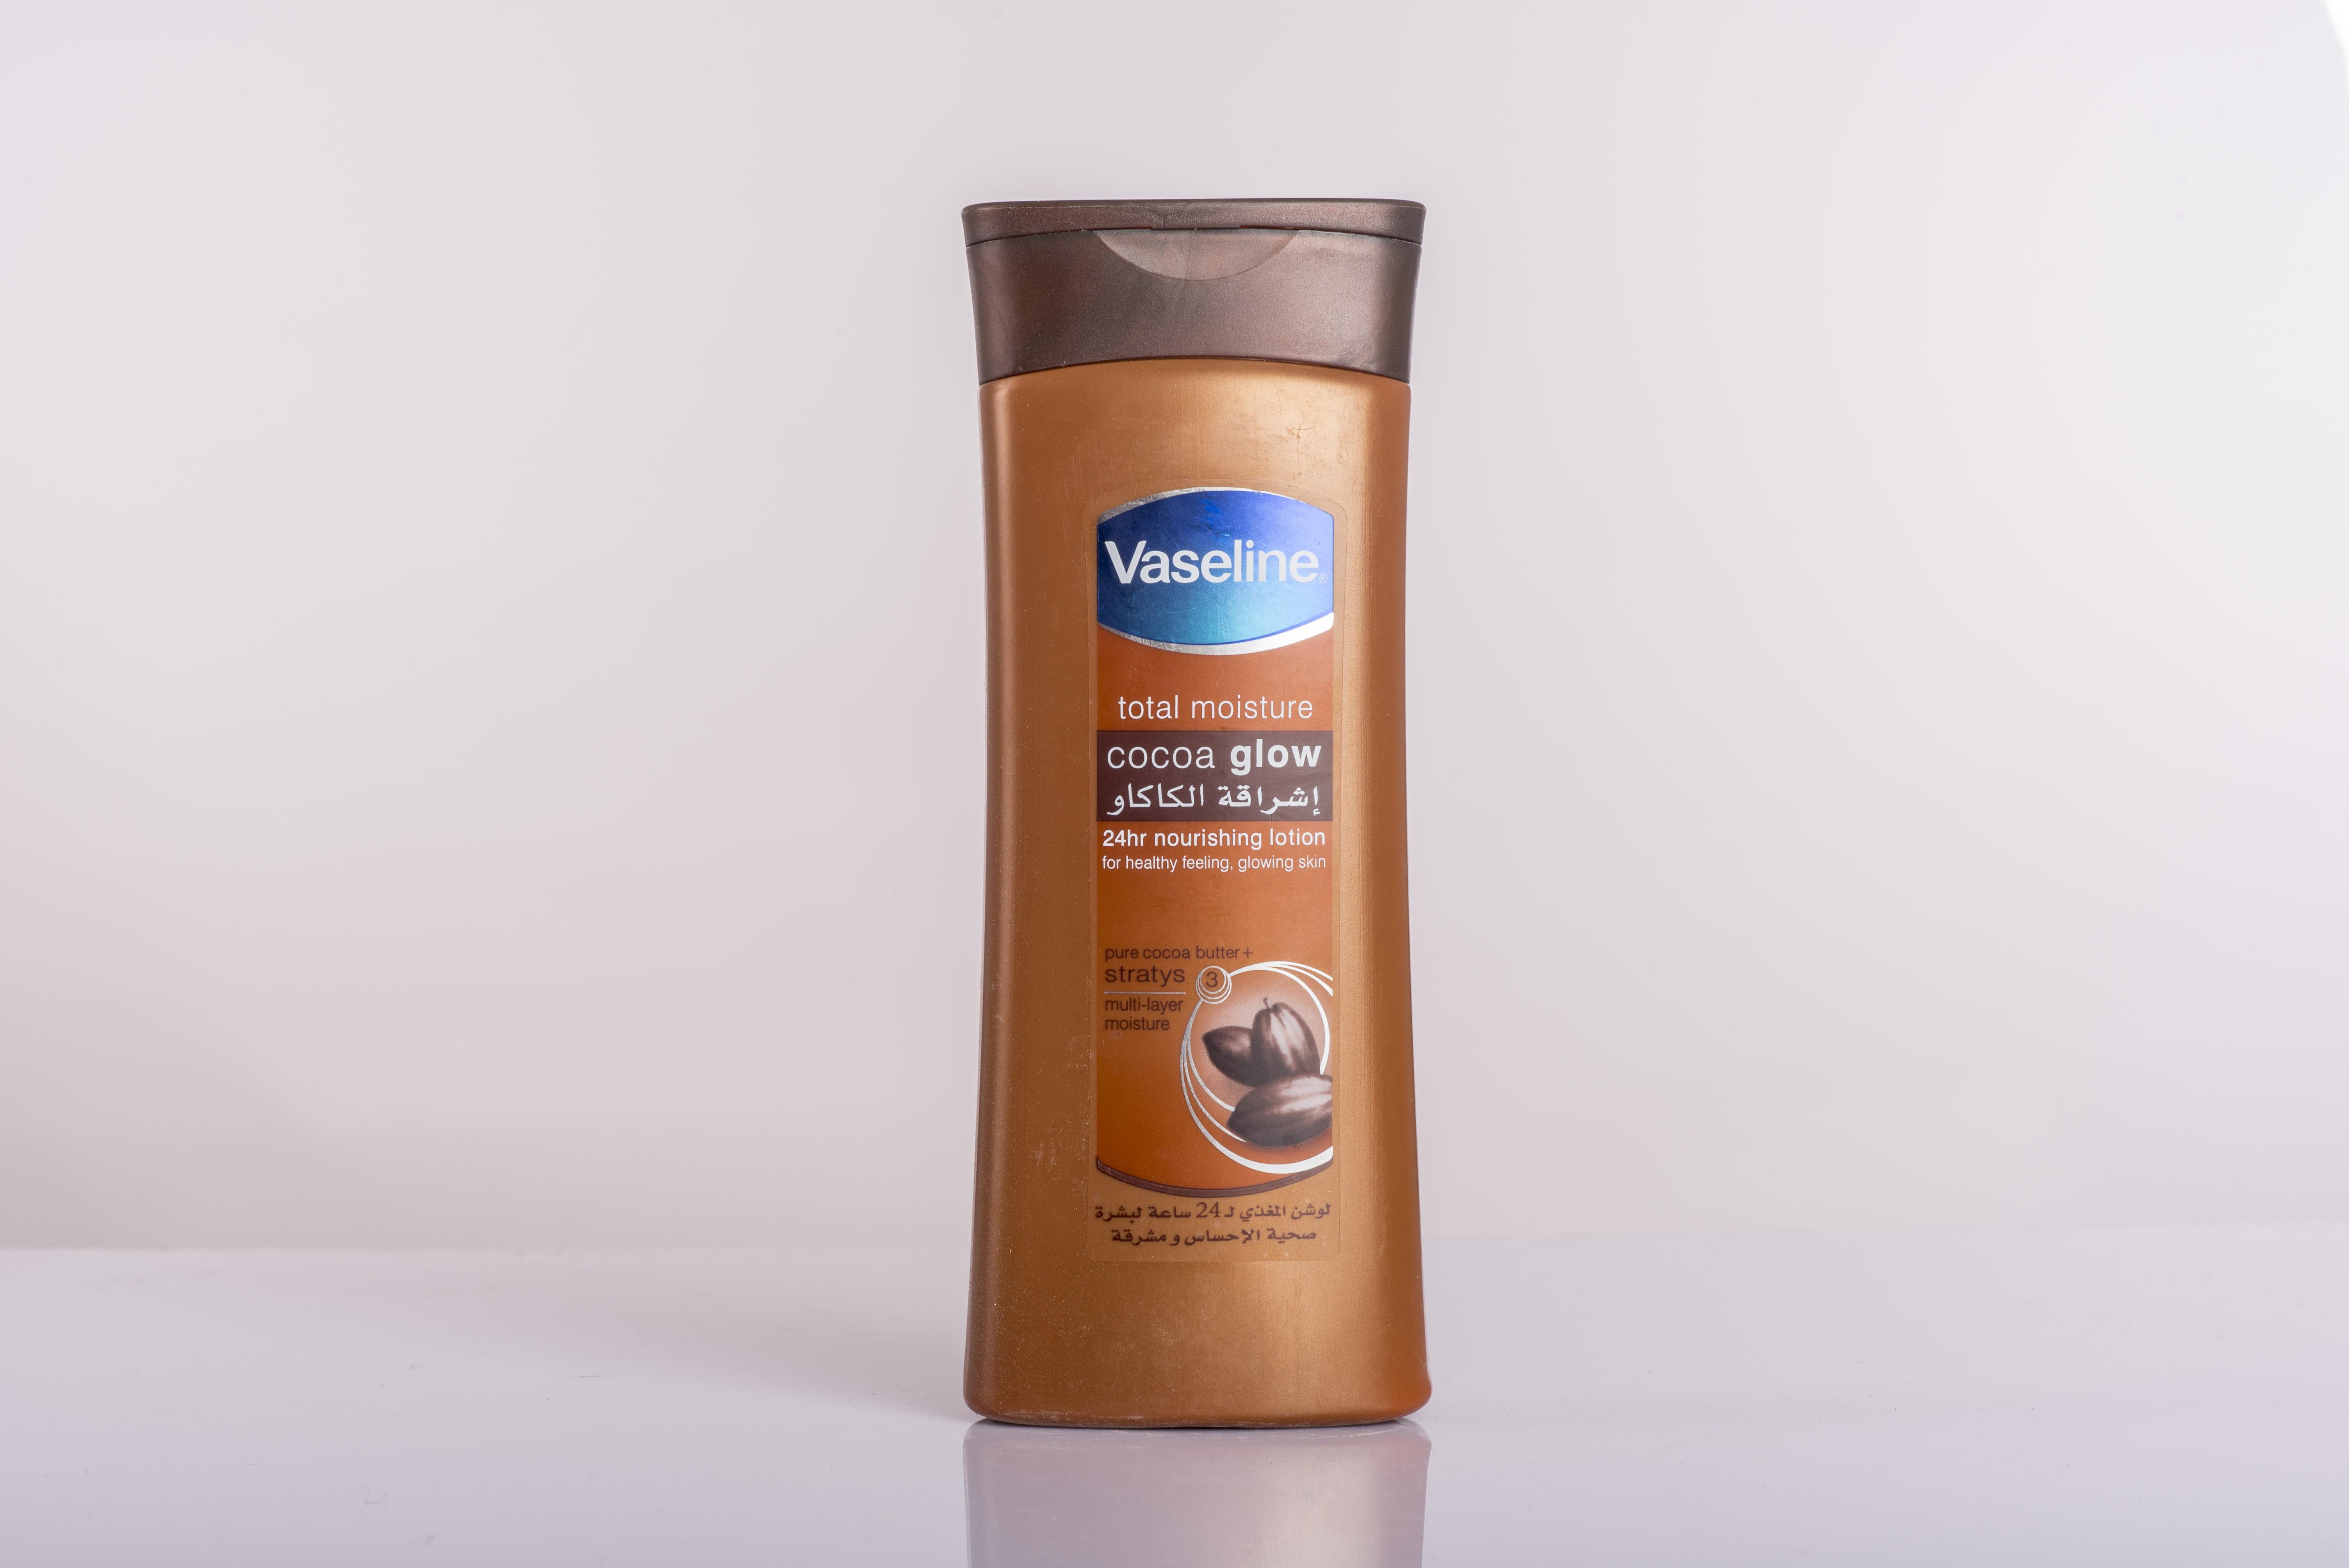 Vaseline Cocoa Glow Body Lotion 400ml In Egypt Home Women Care Moisturizer